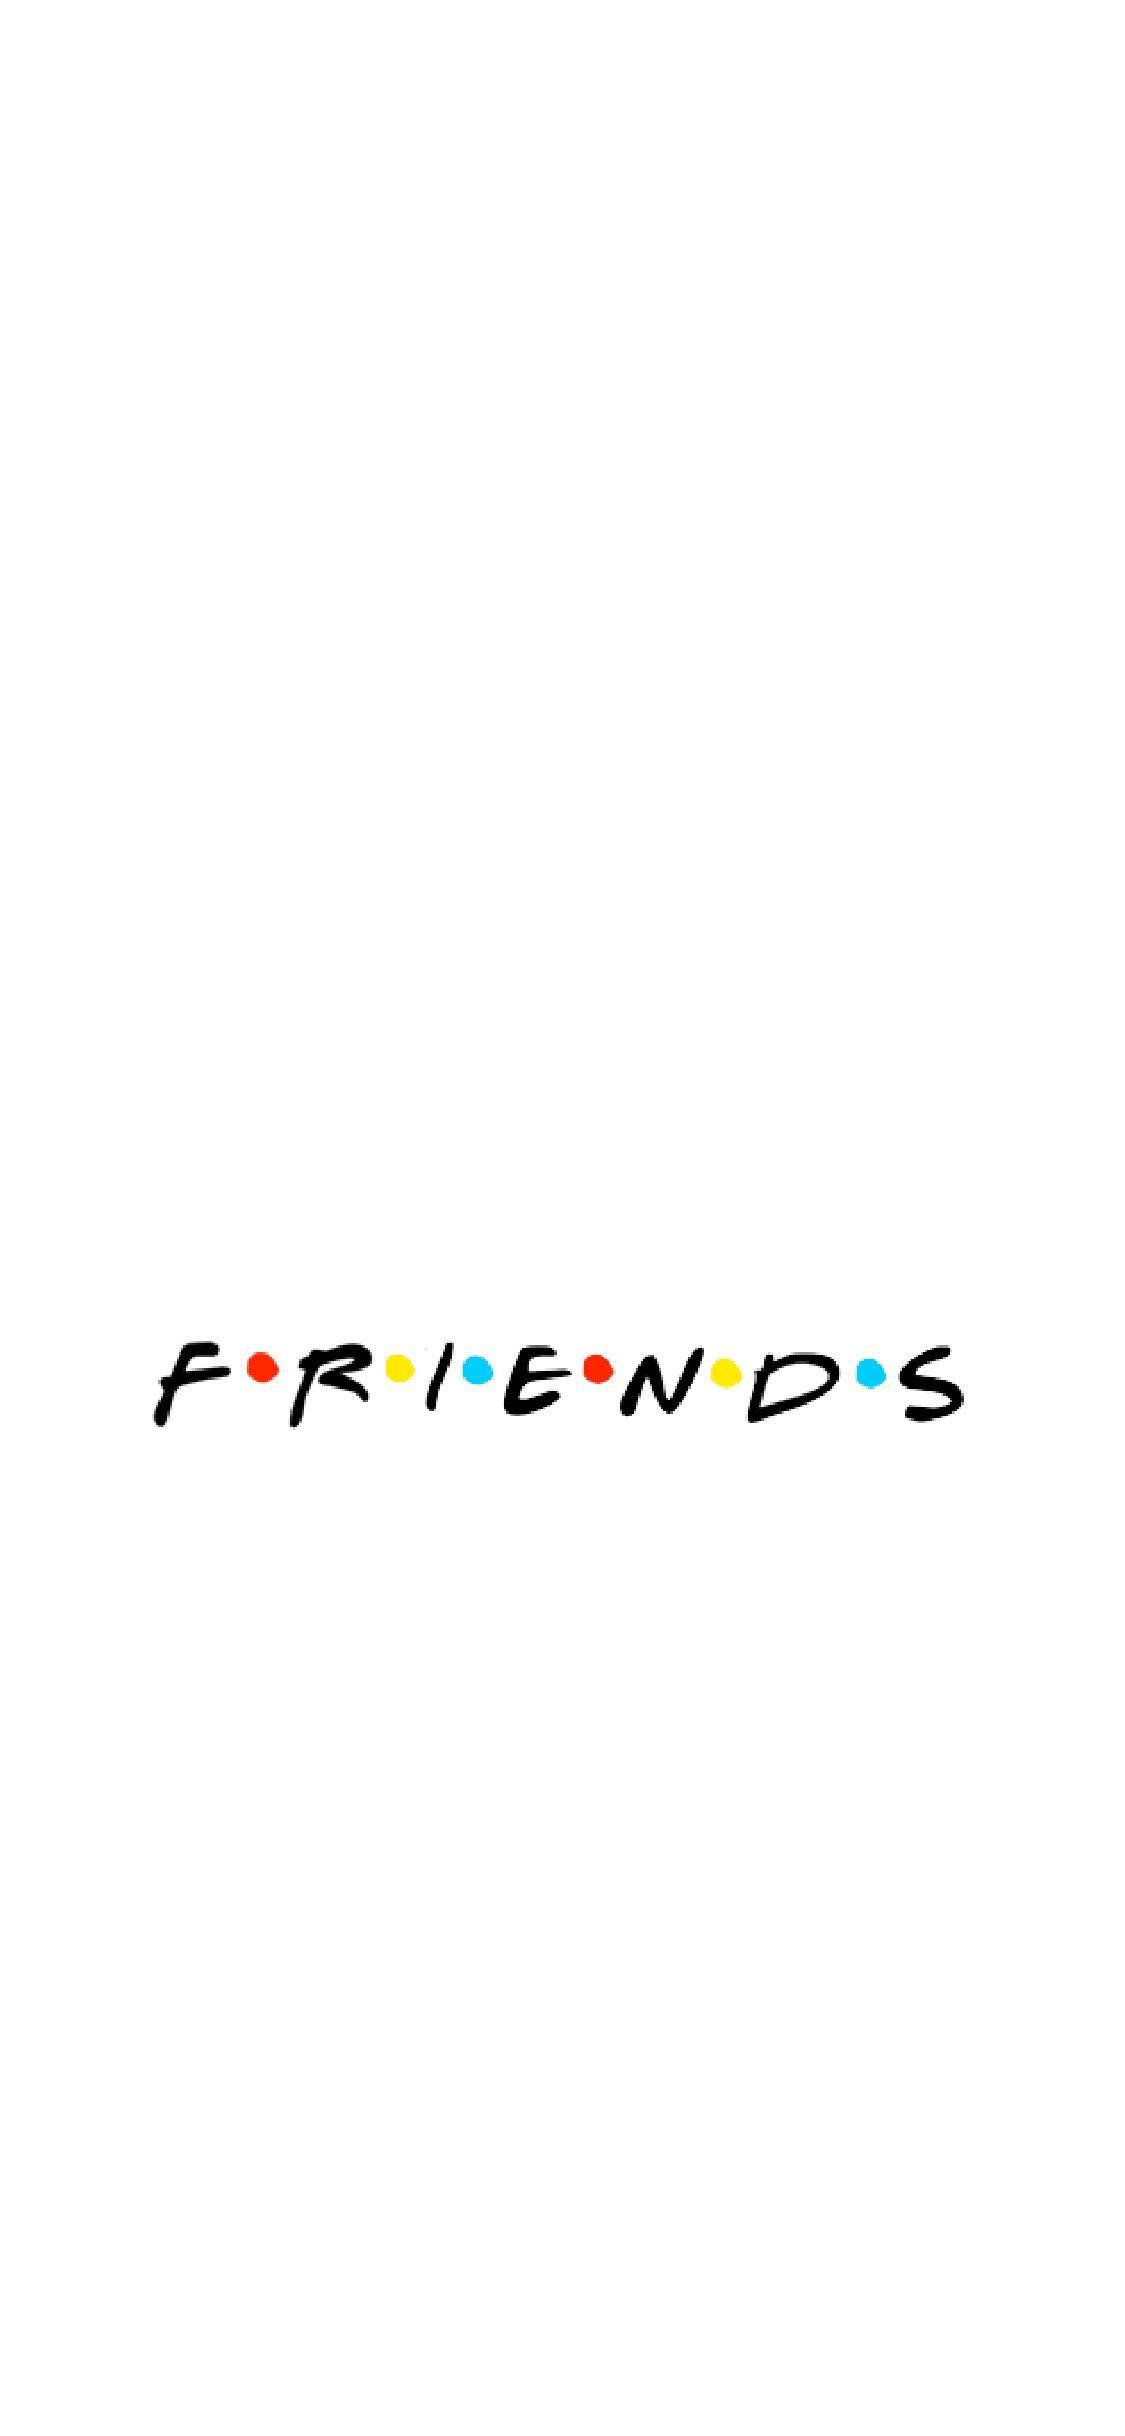 Divertida Amigos De Television De Fondos Para Iphone Cool Wallpapers For Phones Friends Wallpaper Backgrounds Funny